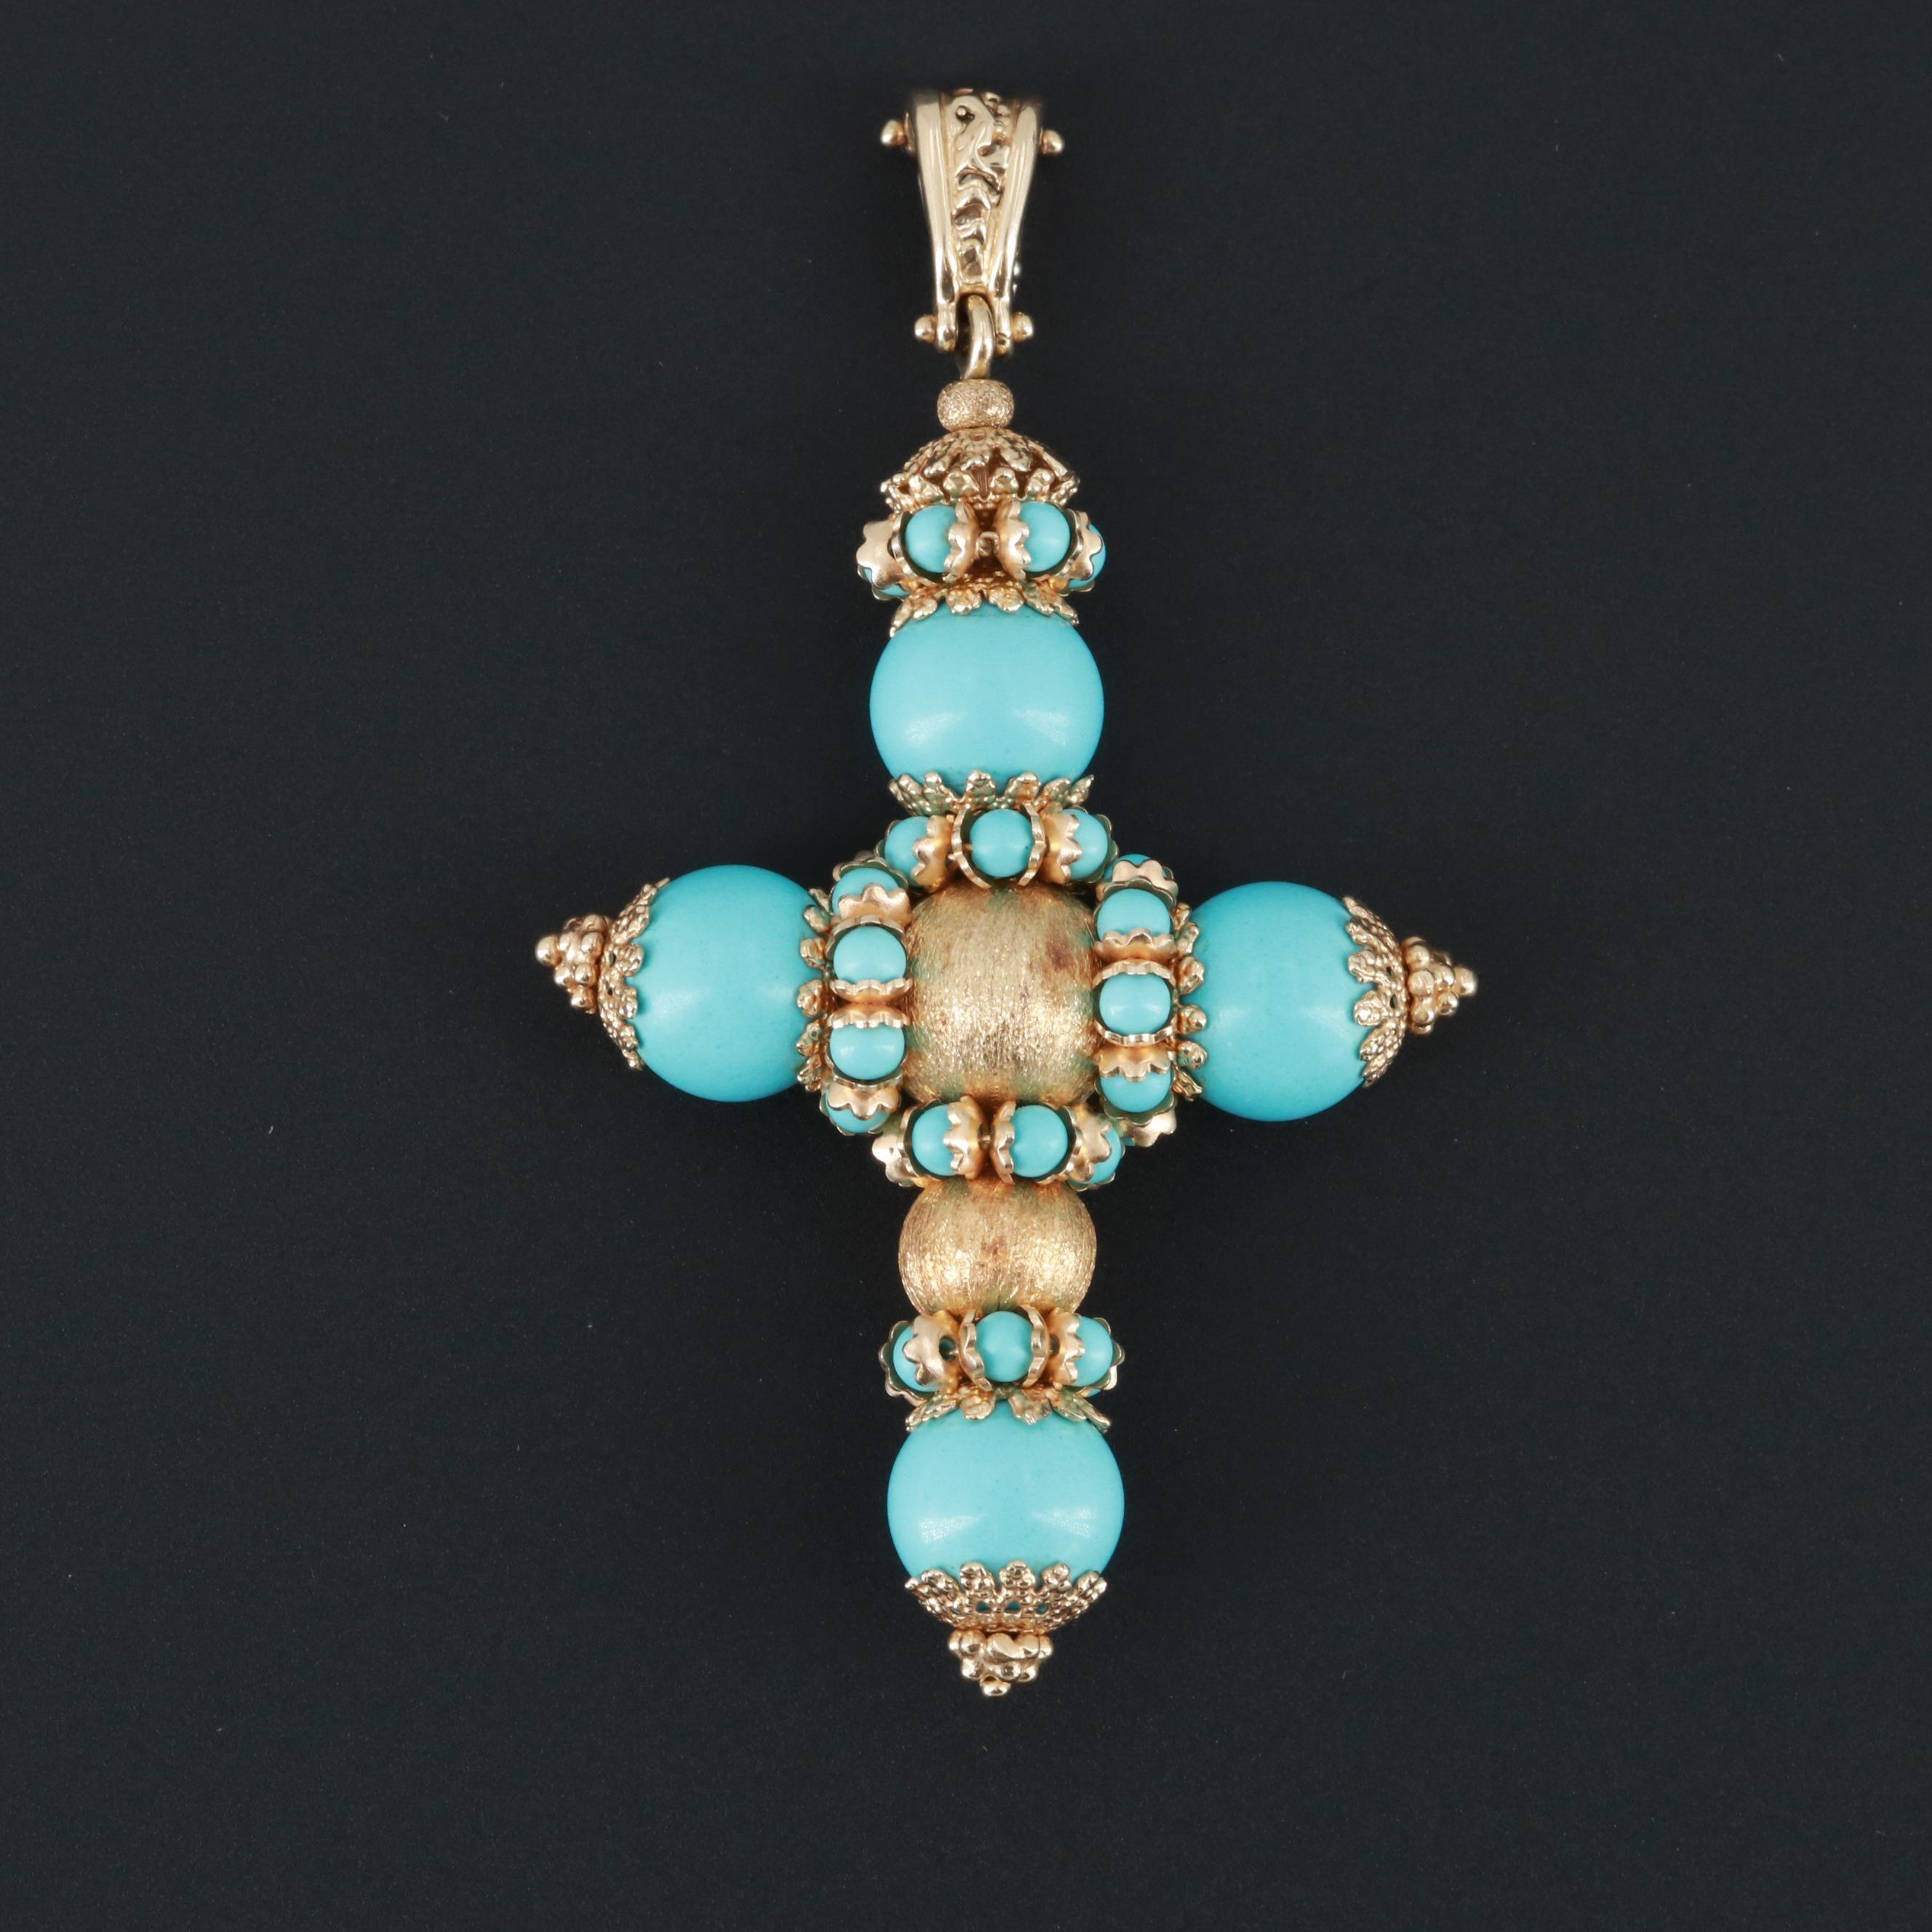 14K Yellow Gold Imitation Turquoise Cross Enhancer Pendant